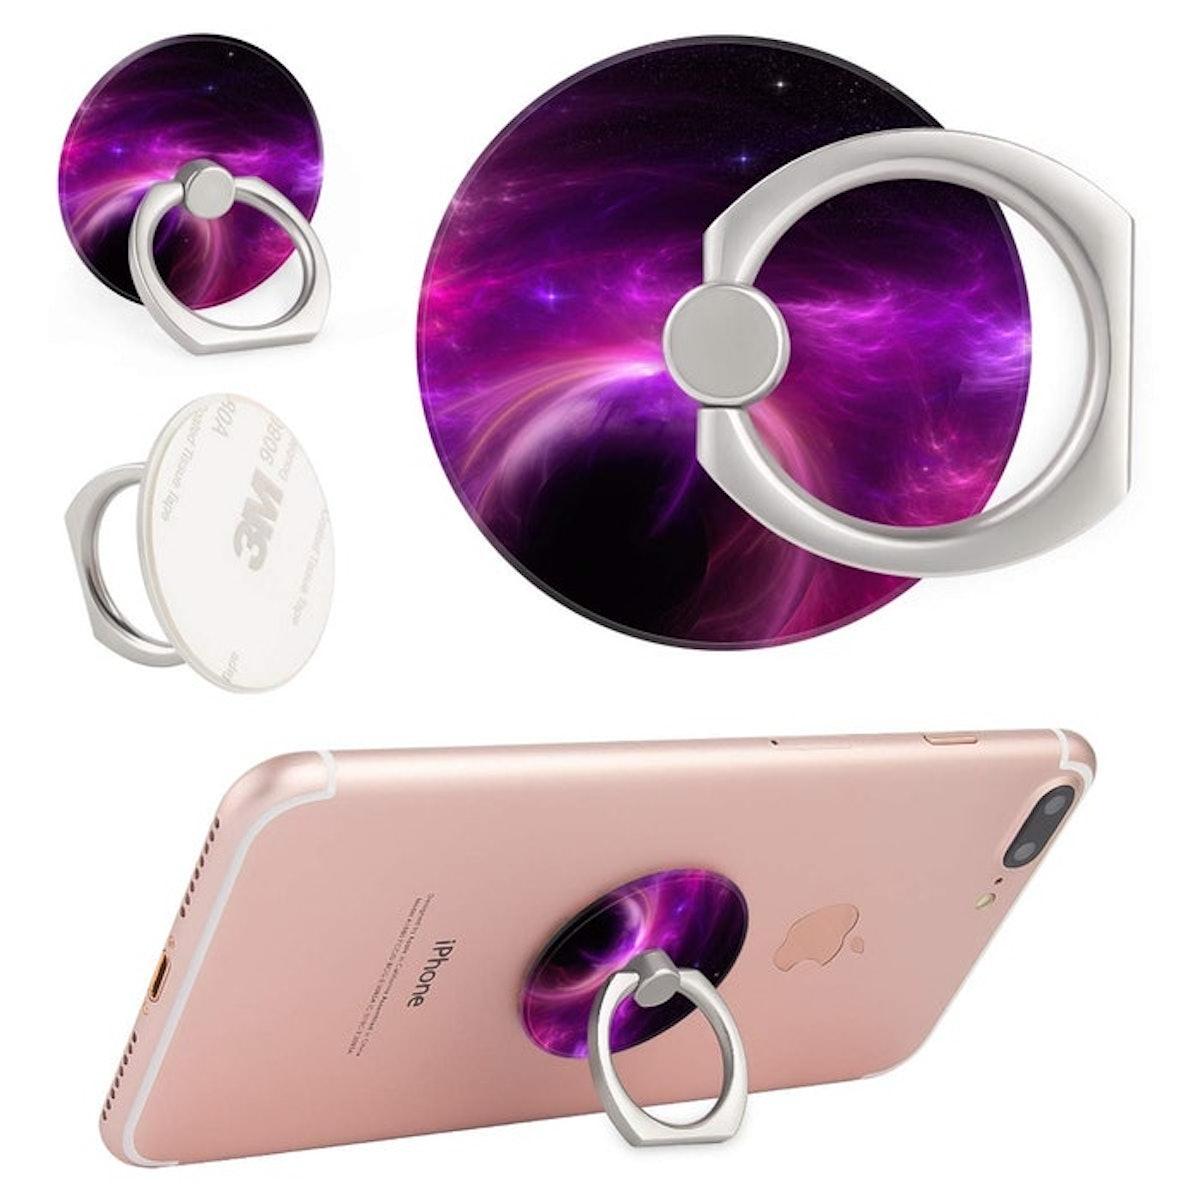 Galaxy Ring Phone Holder